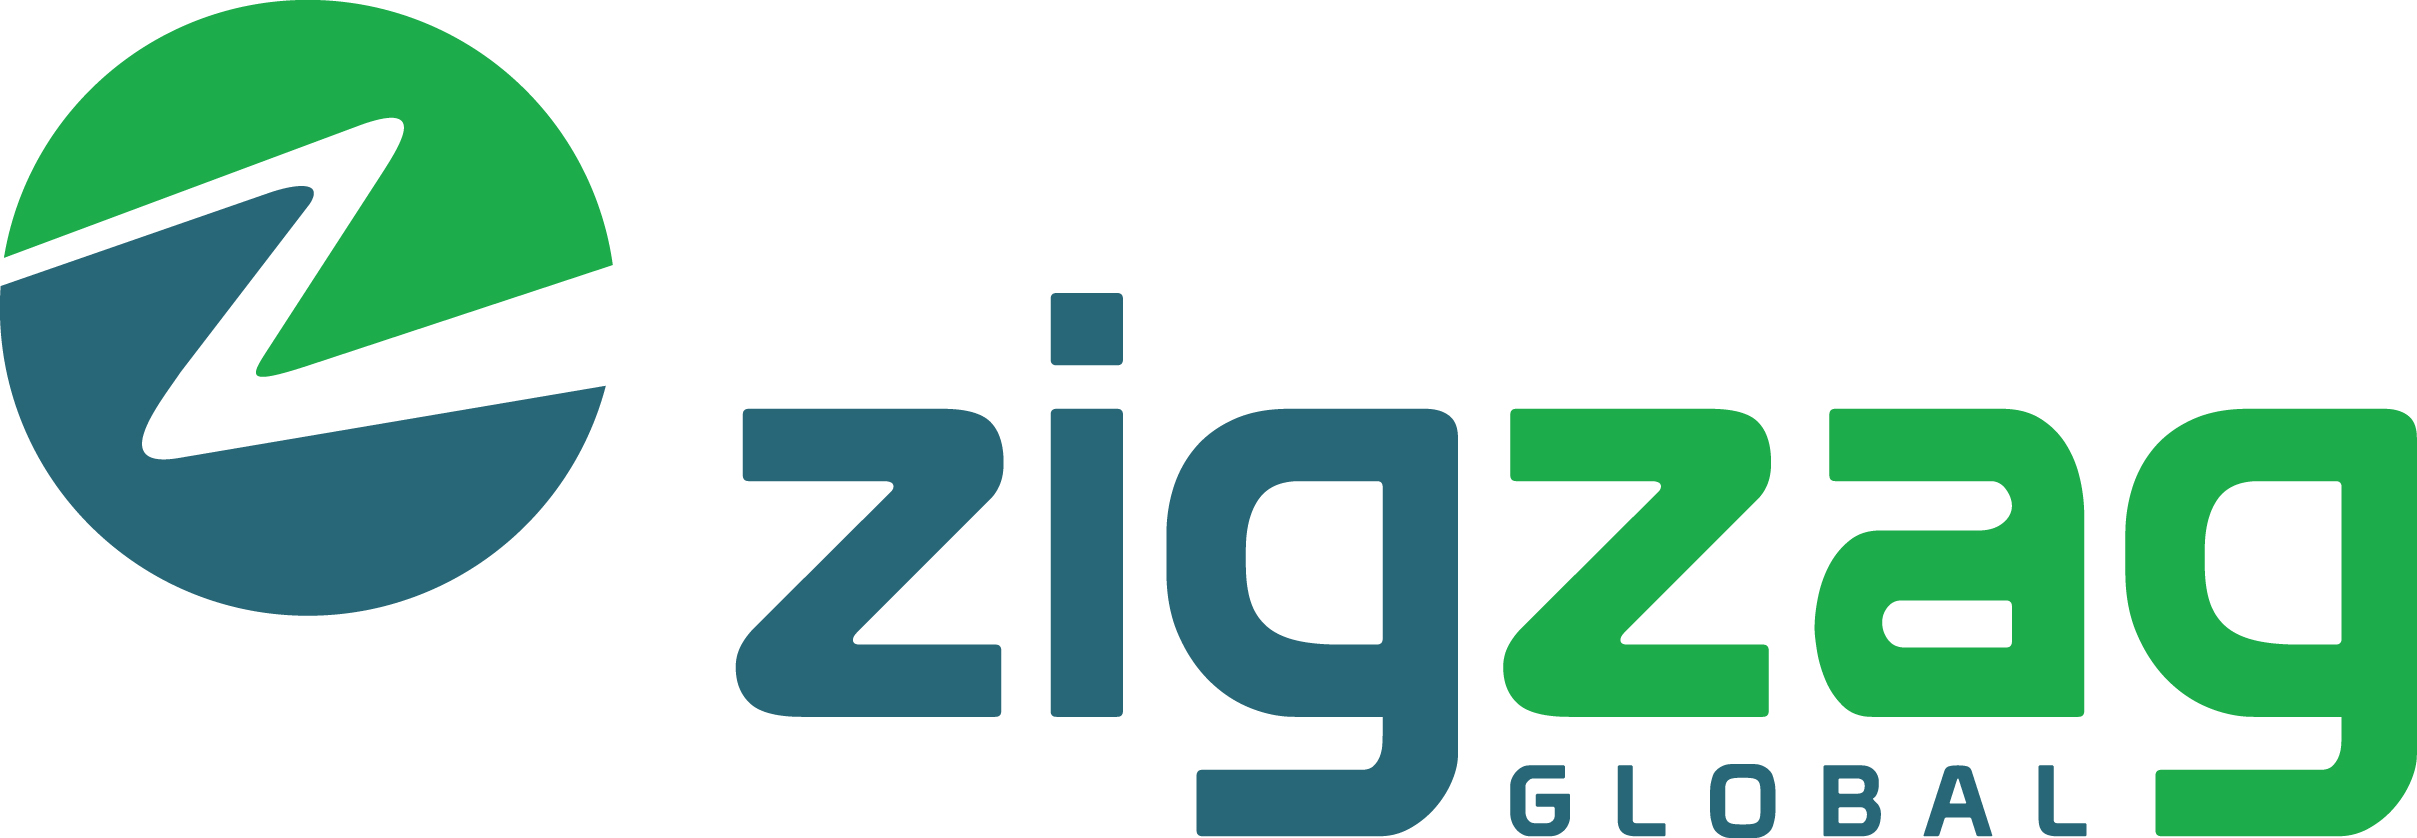 NUMA Startup Accelerator ZigZag Global Global Blue Acquisition